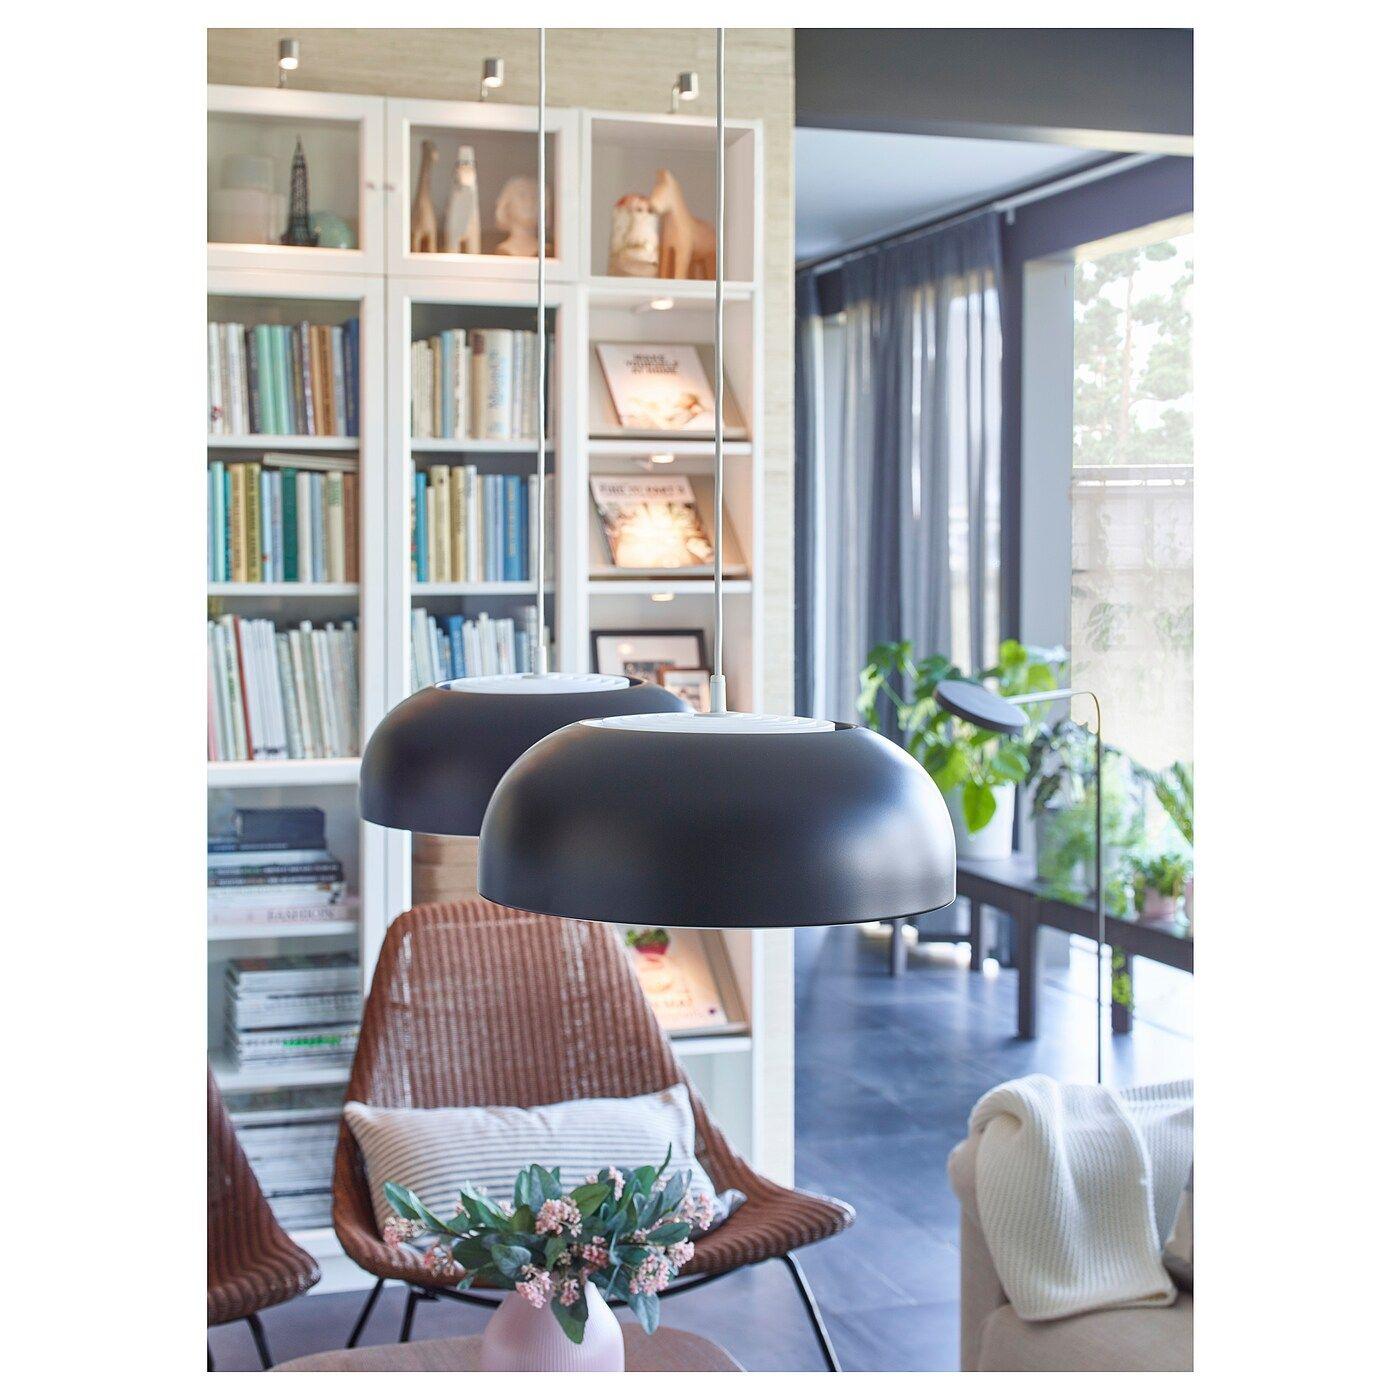 Nymane Pendant Lamp Anthracite Ikea In 2020 Pendant Lamp Rooms Home Decor Ikea